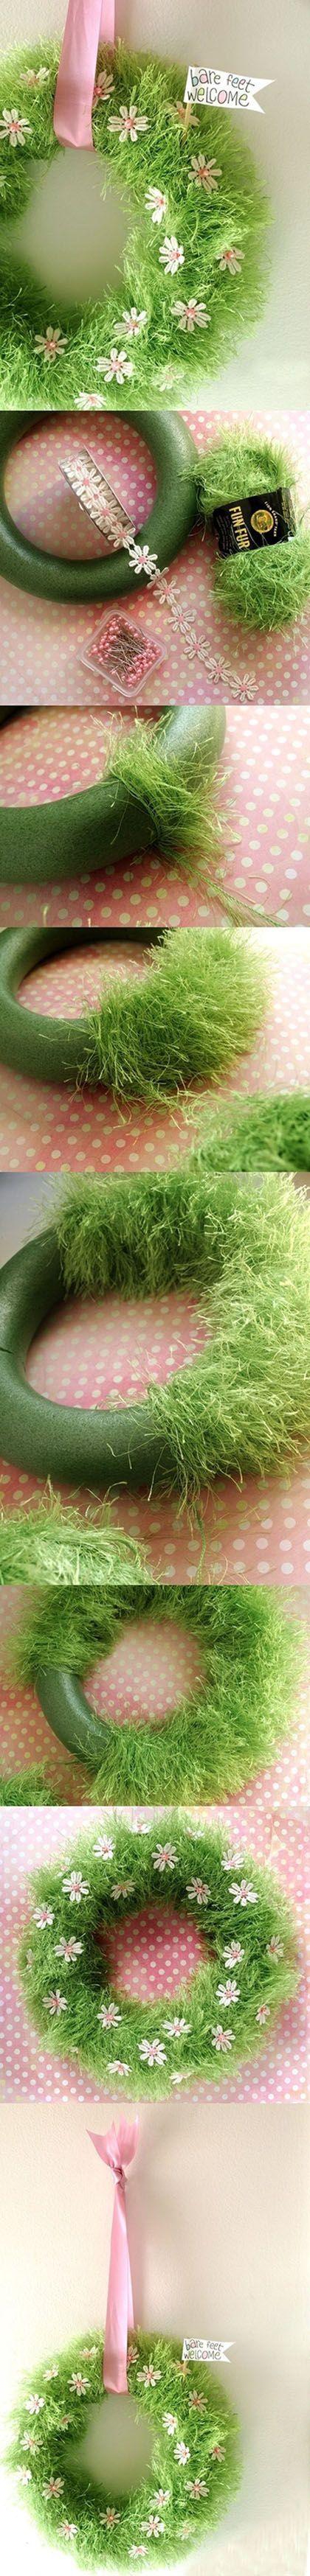 "Adorable ""Bare Feet Welcome"" DIY Spring Wreath Idea via Lots DIY"